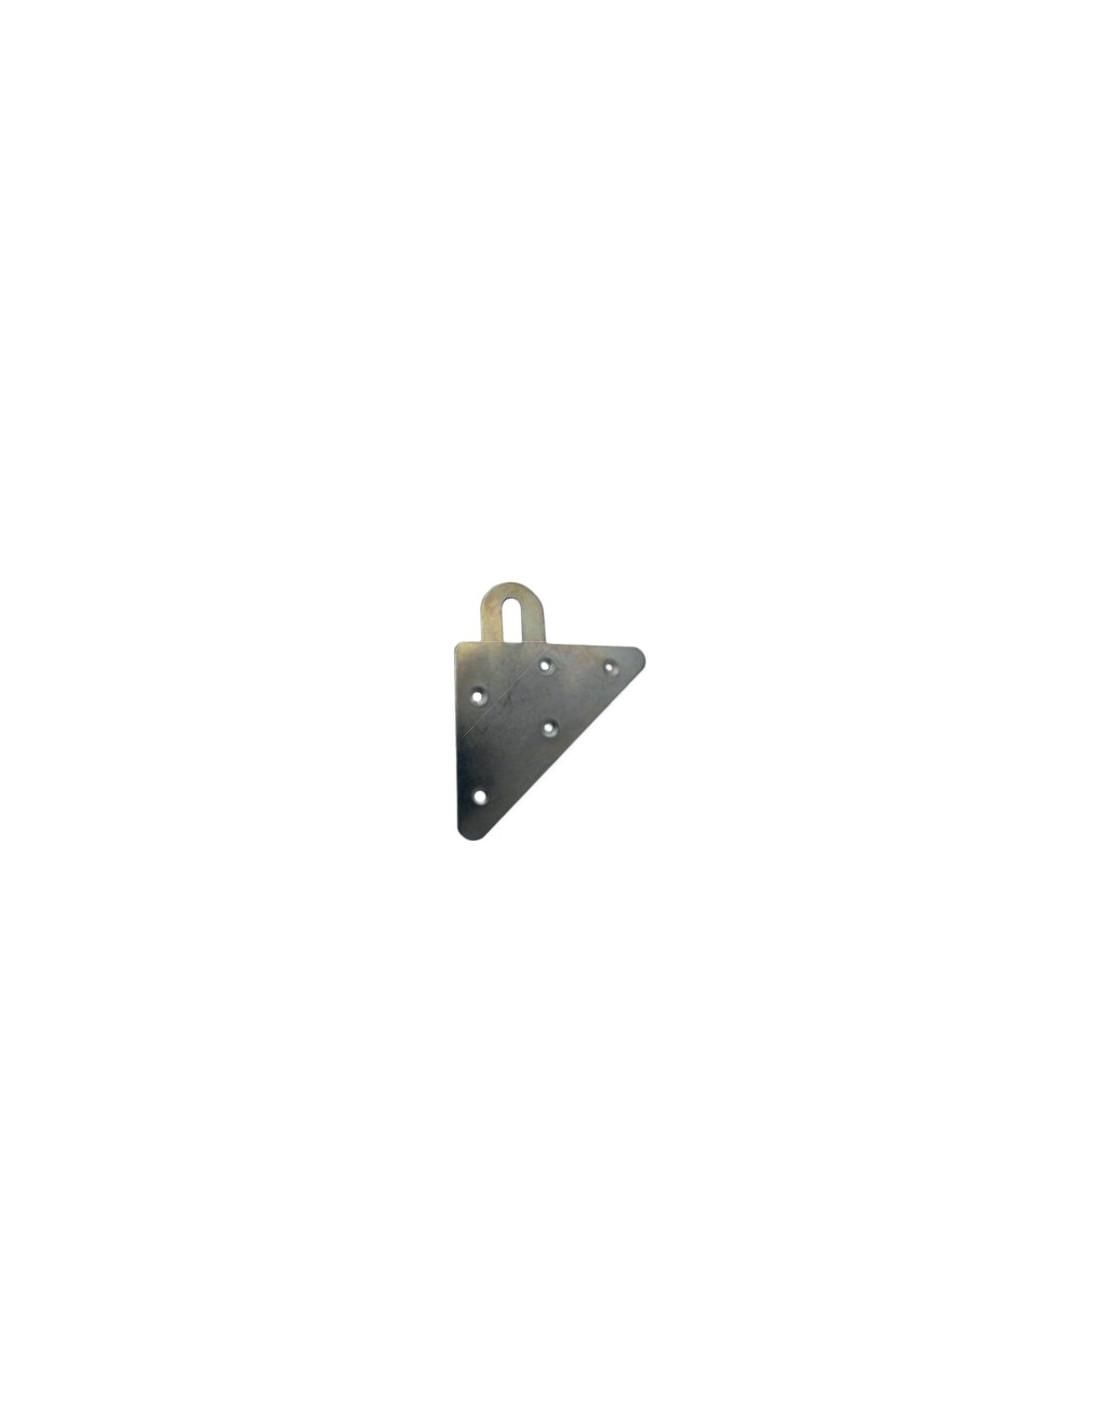 norail attache pour porte manteau triangle r versible hyper brico. Black Bedroom Furniture Sets. Home Design Ideas